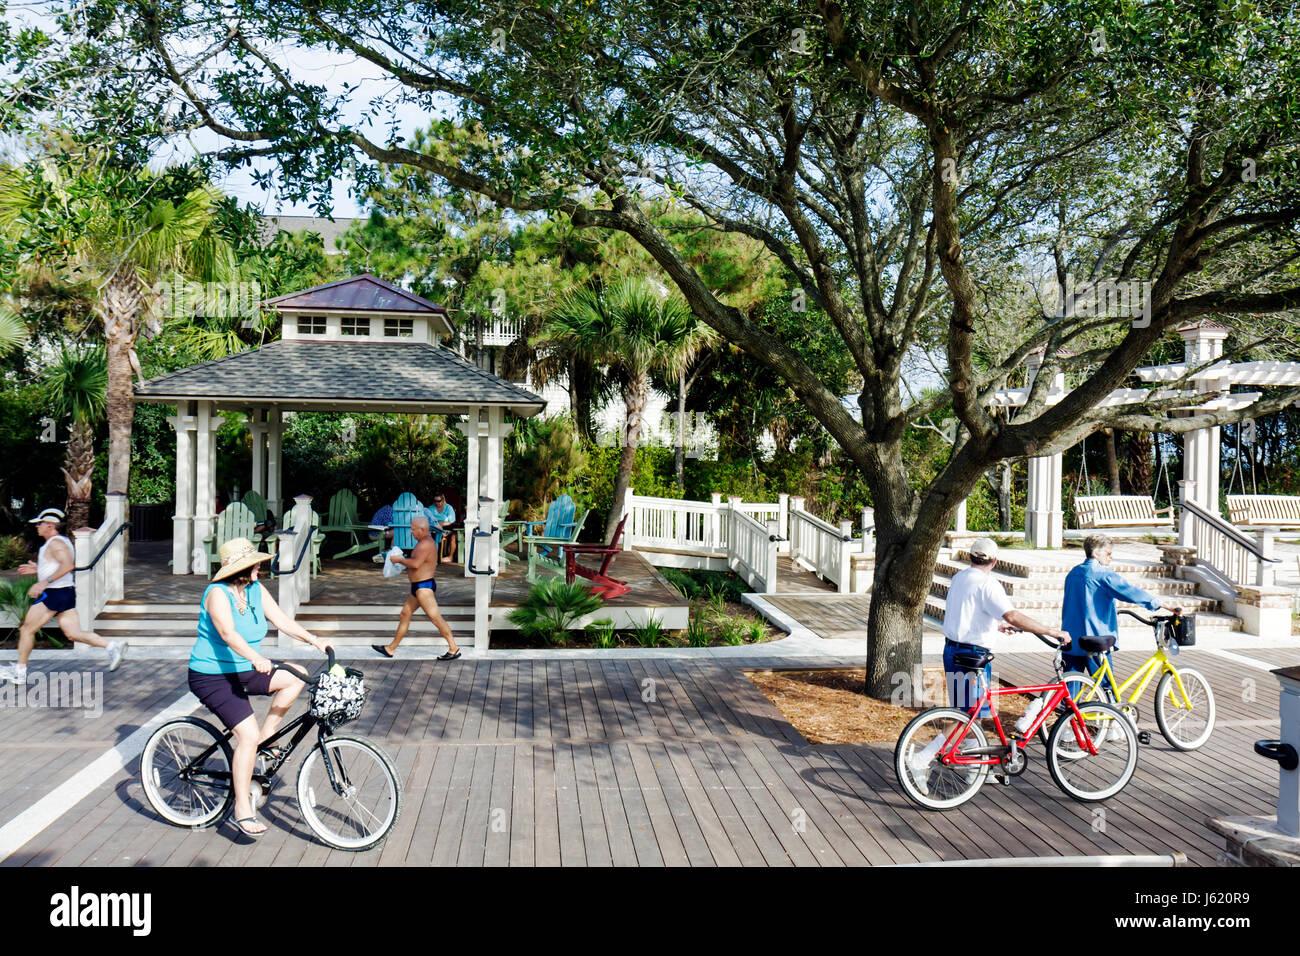 South Carolina Hilton Head Island South Forest Beach Atlantic Ocean resort Coligny Beach Park public beach access - Stock Image